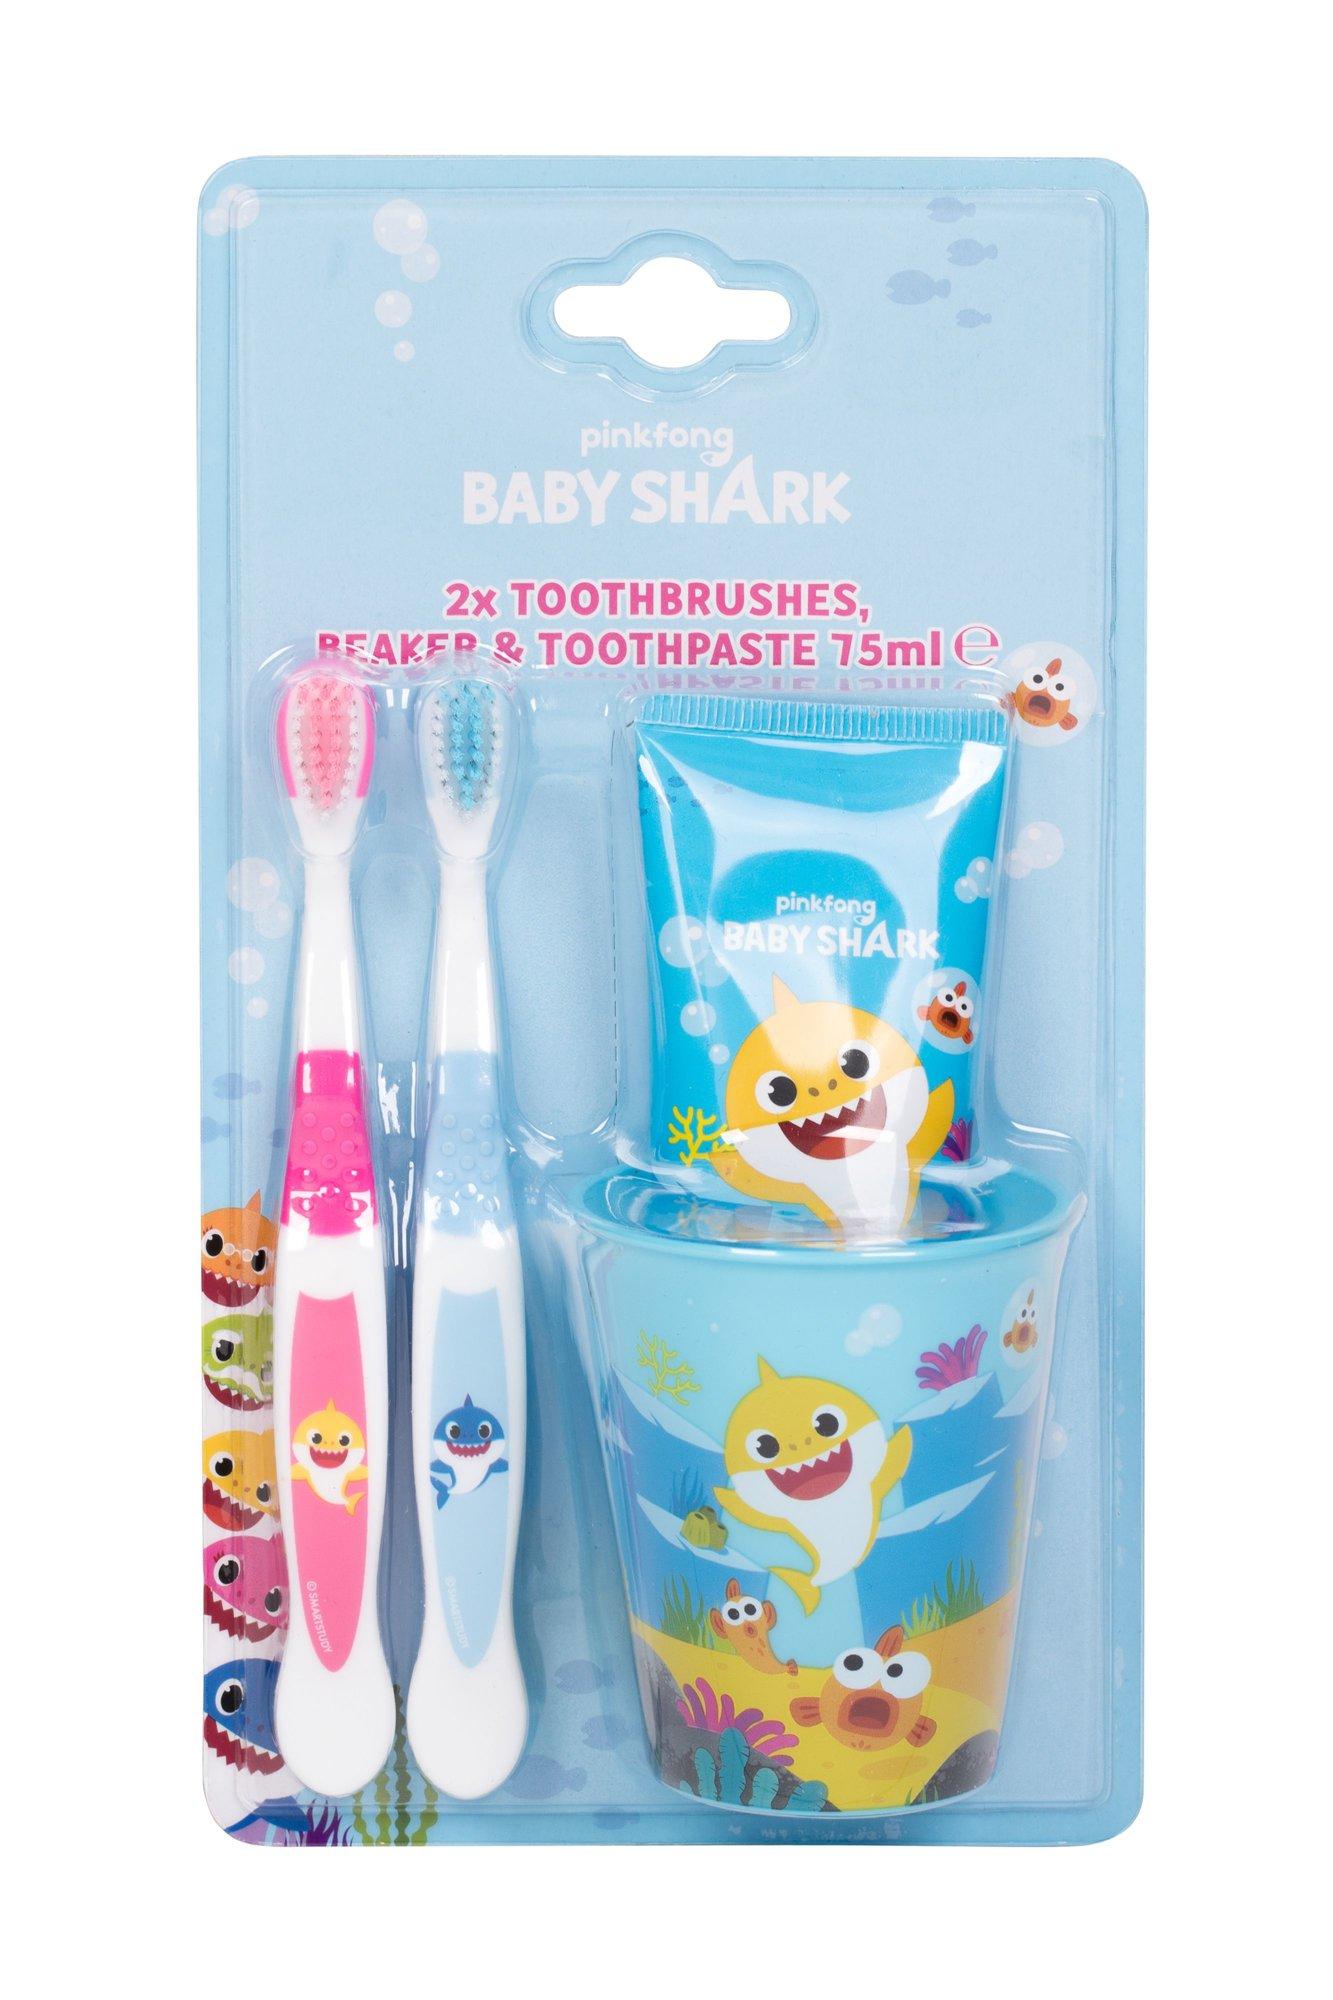 Pinkfong Baby Shark Toothbrush 2ml